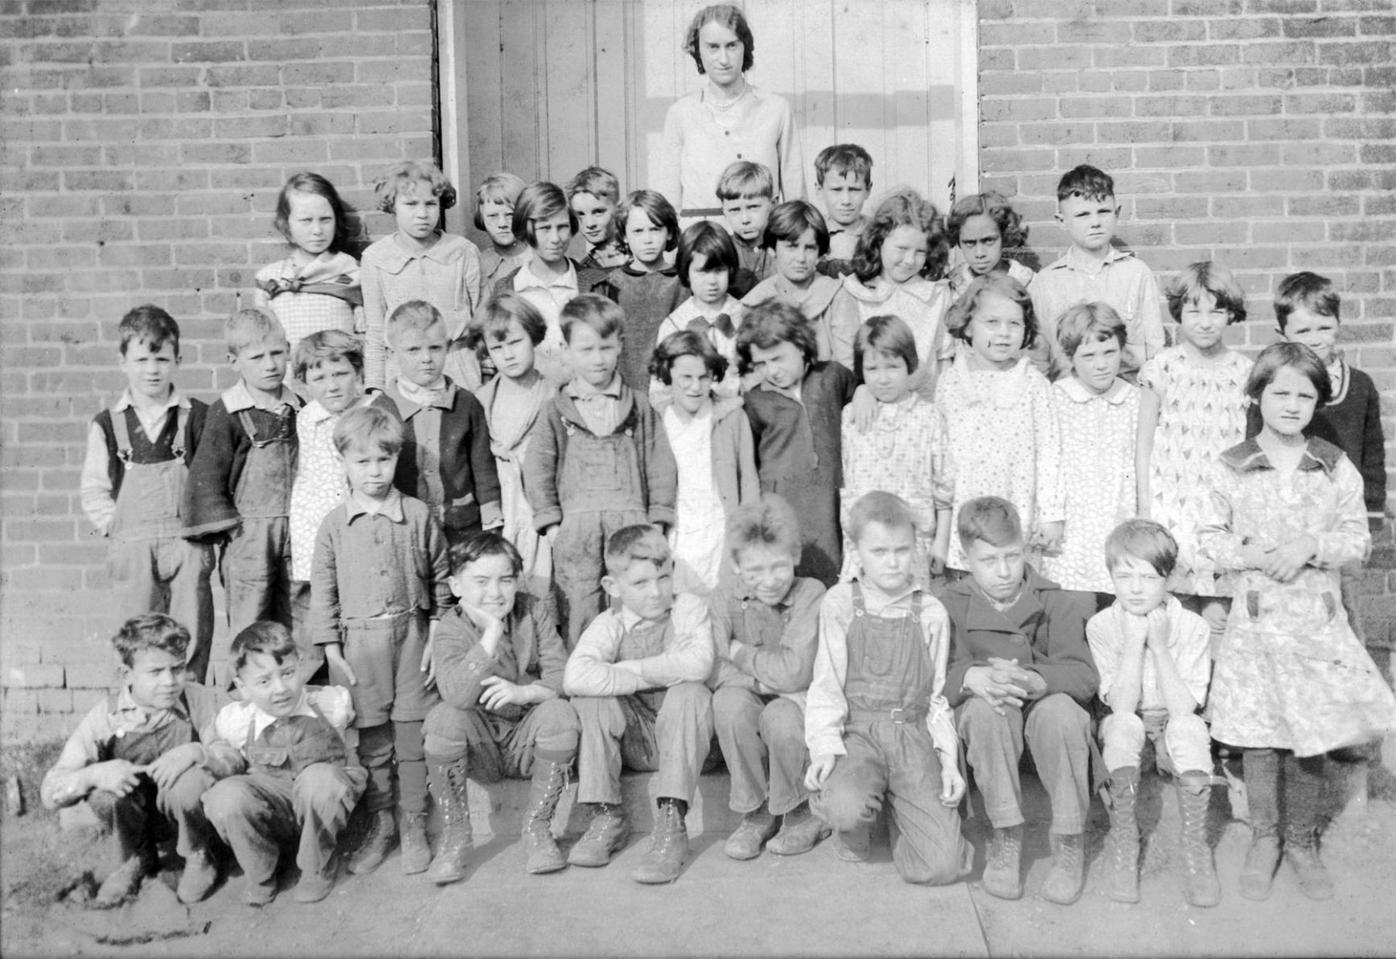 Omega School 1931 from estate of Vince Scott